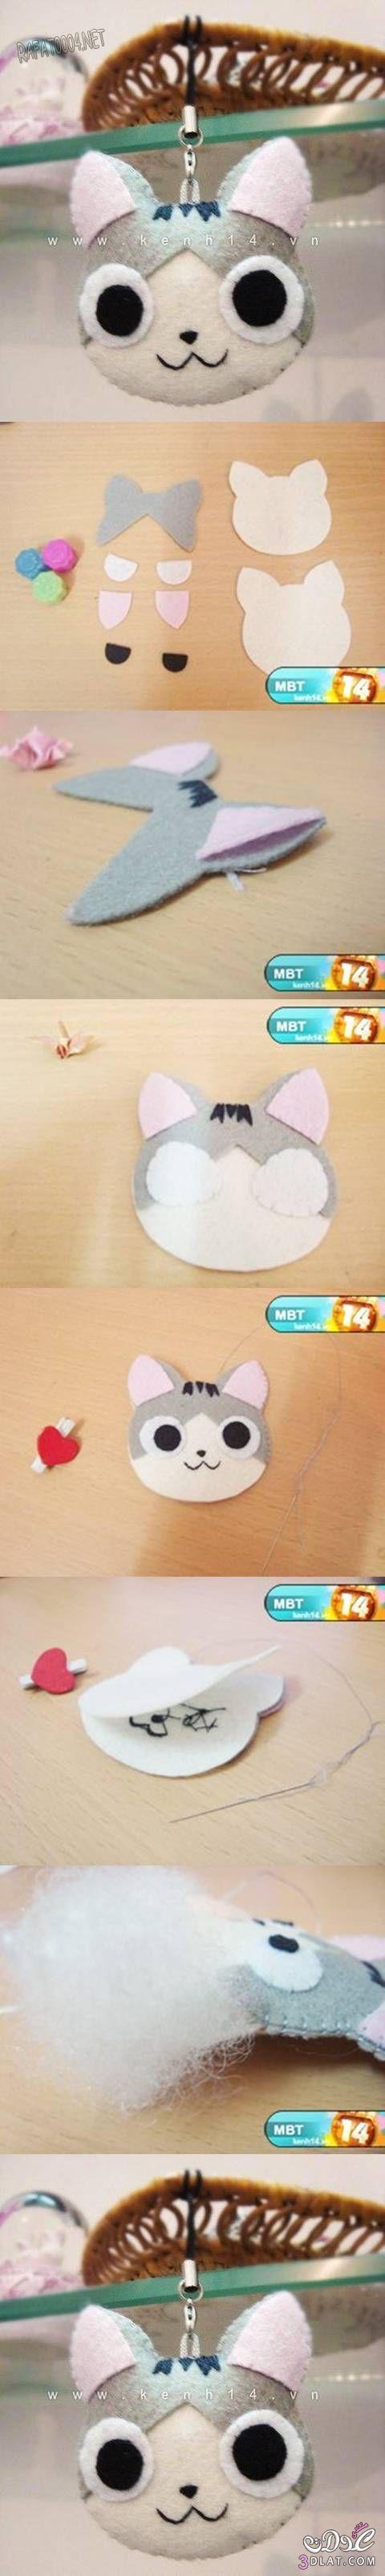 ����� ��� ����� ������ ��� ��� ��� kitten keychain 13892043451.jpg